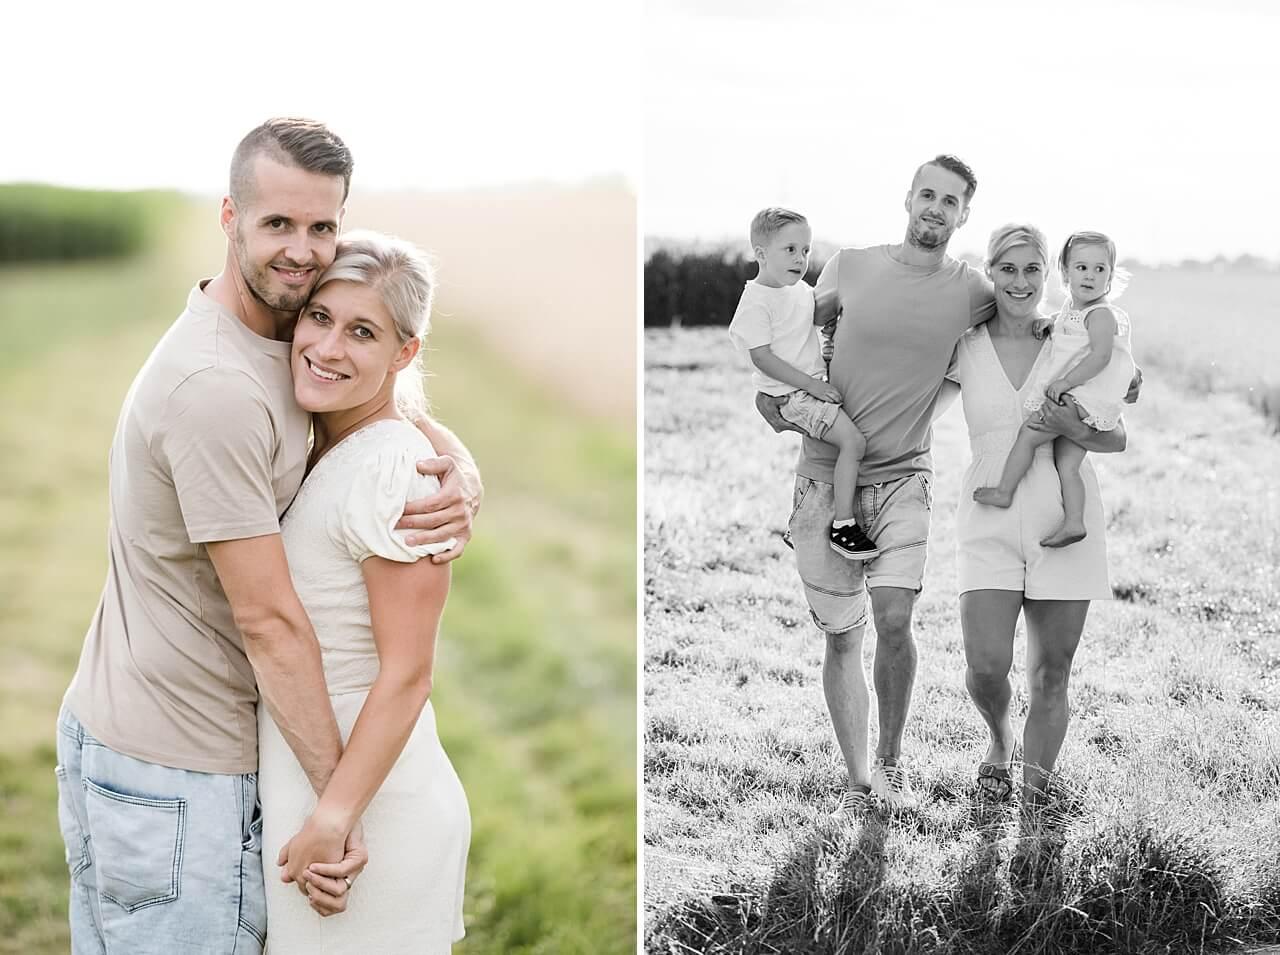 Rebecca Conte Fotografie: Familienbilder in Remseck 11